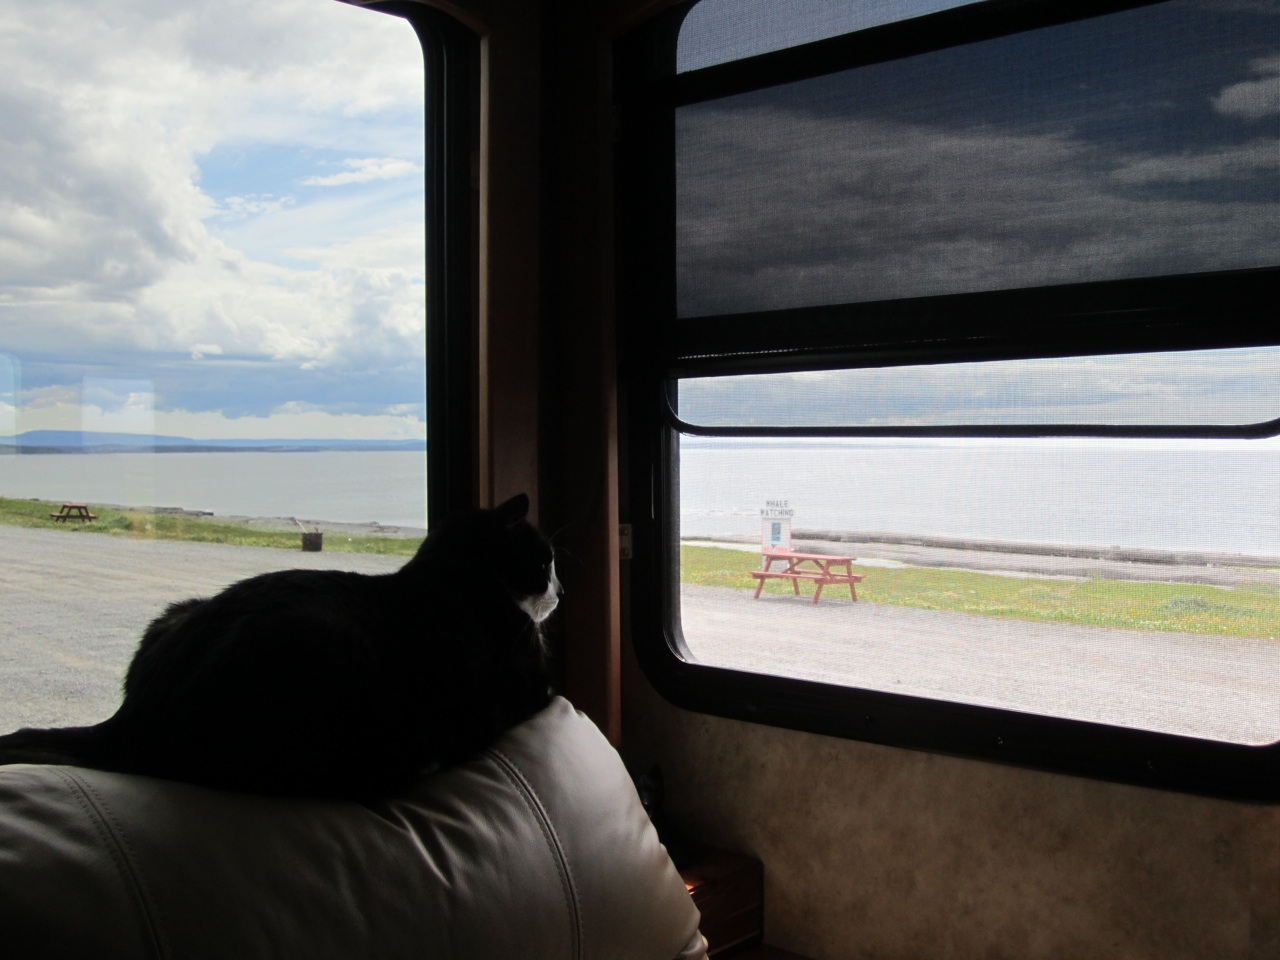 BK Enjoying The Fresh Sea Air And Wonderful View